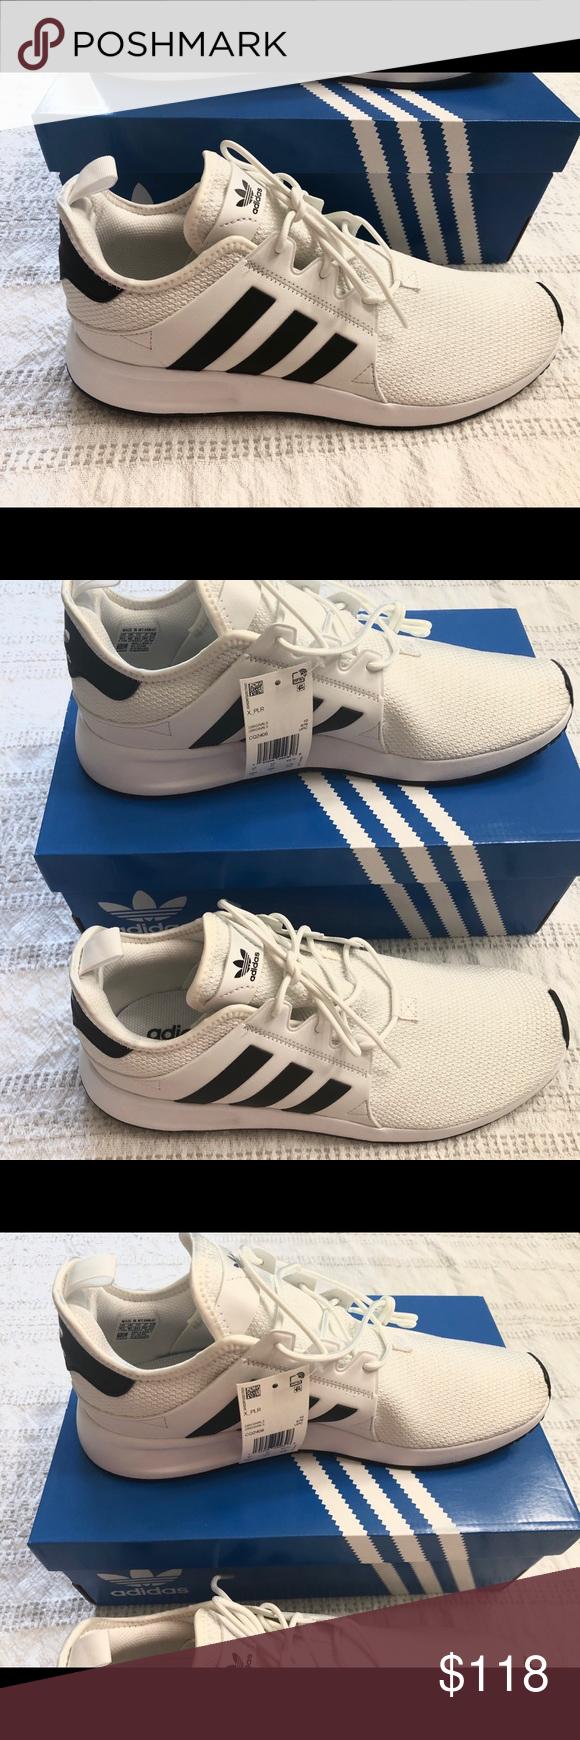 Adidas Men's athlete shoes size 10 1/2 Adidas Men's athlete shoes ...